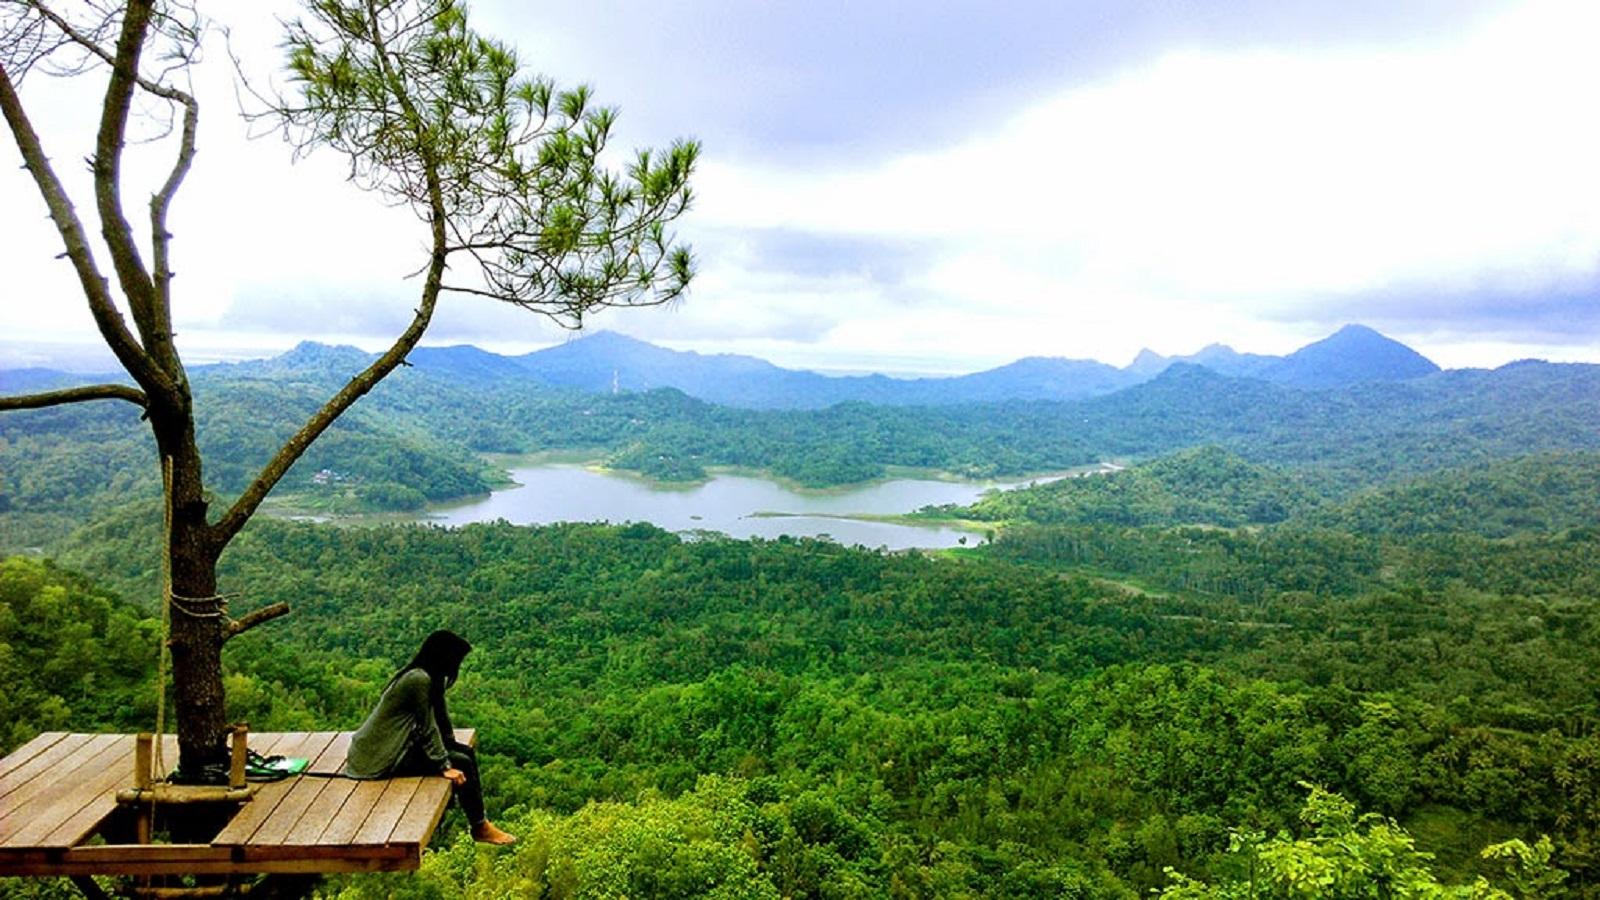 wisata flying fox jogja TEMPAT WISATA MENARIK DI JOGJA YOGYAKARTA INFO BUDAYA